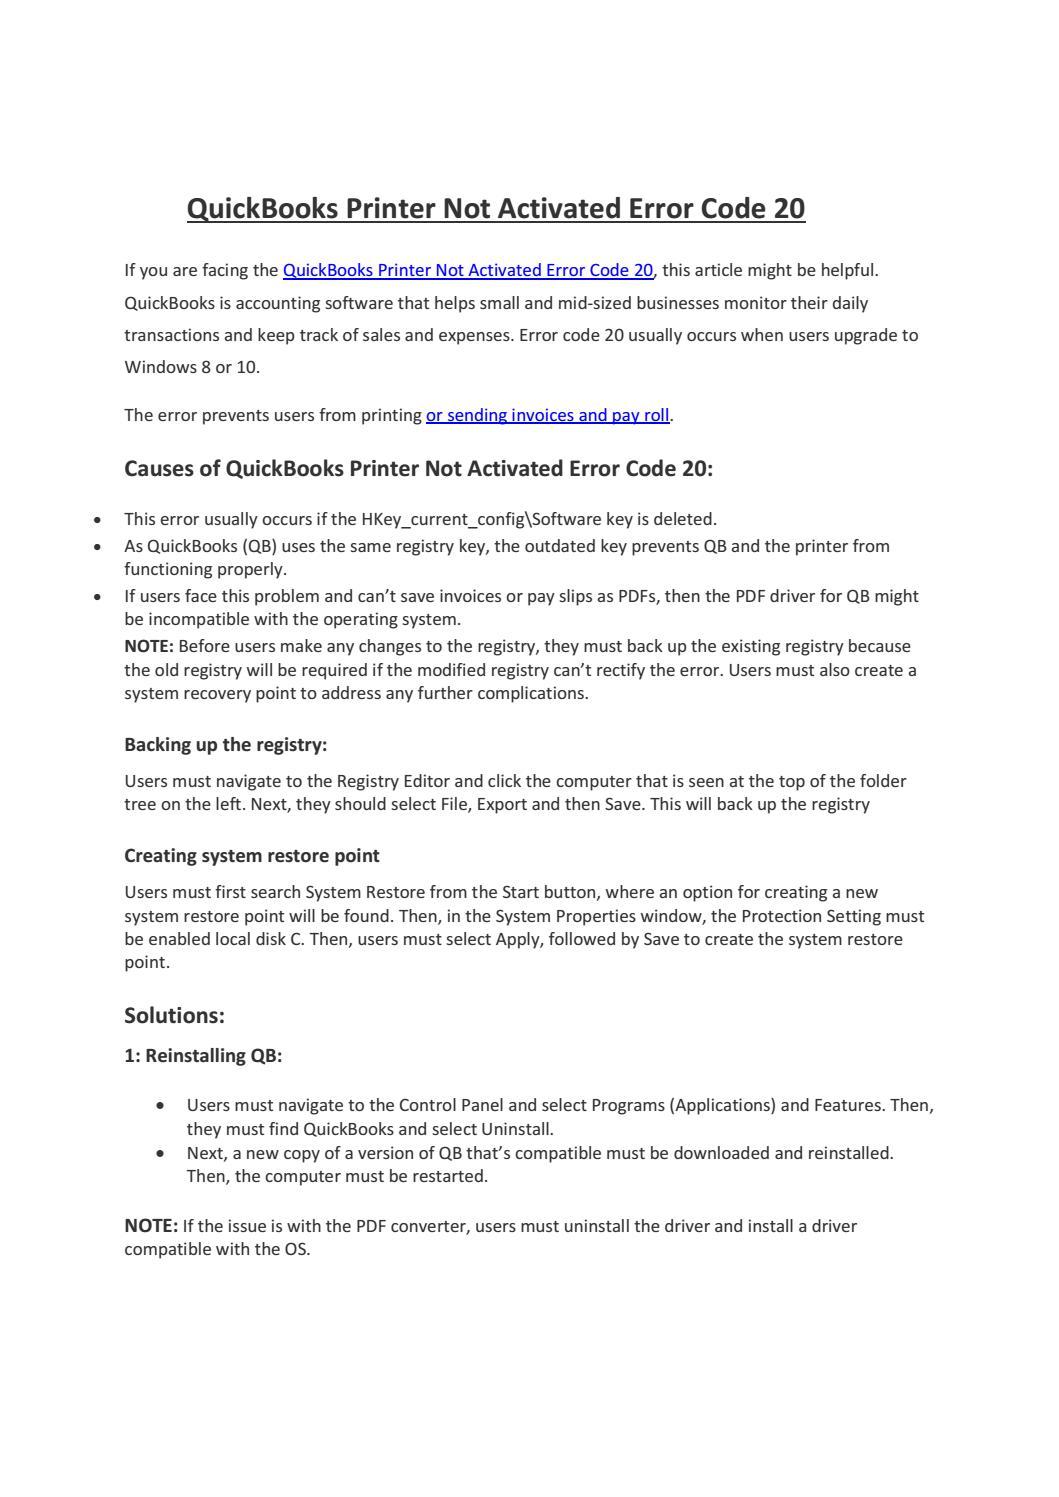 QuickBooks Printer Not Activated Error Code 20 by Sadio Mane - issuu